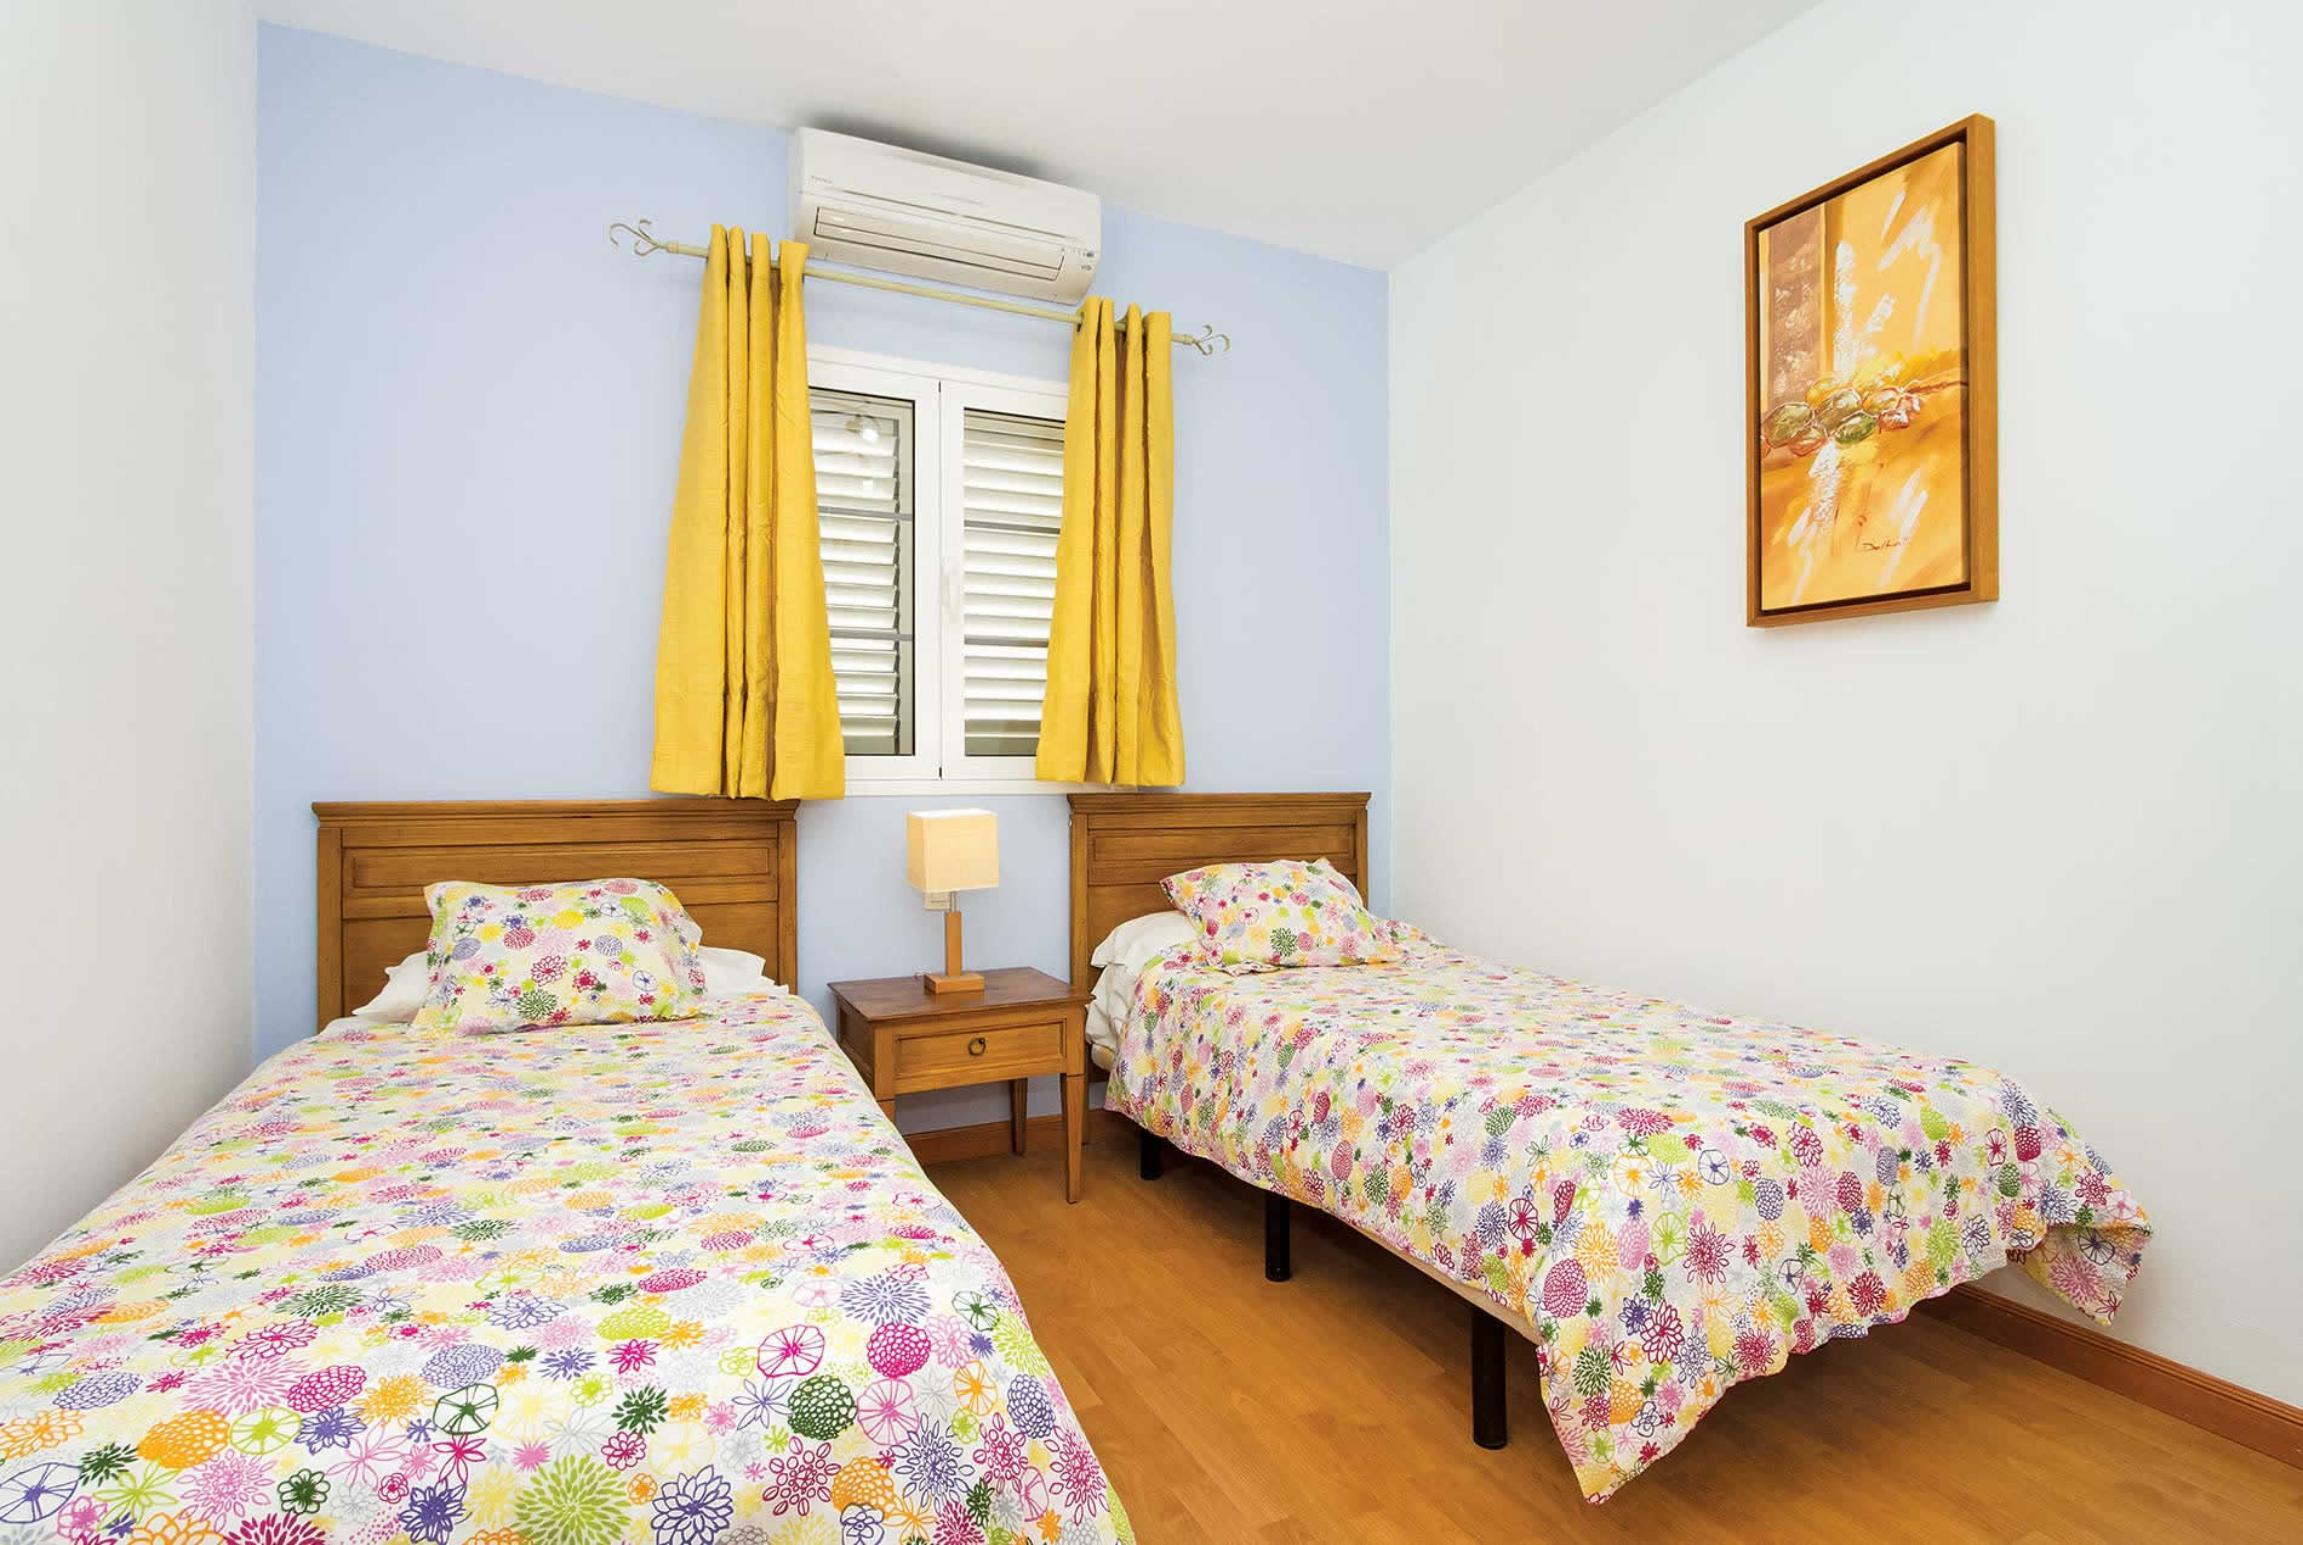 Ferienhaus Casa Candela (2654390), Puerto del Carmen, Lanzarote, Kanarische Inseln, Spanien, Bild 6